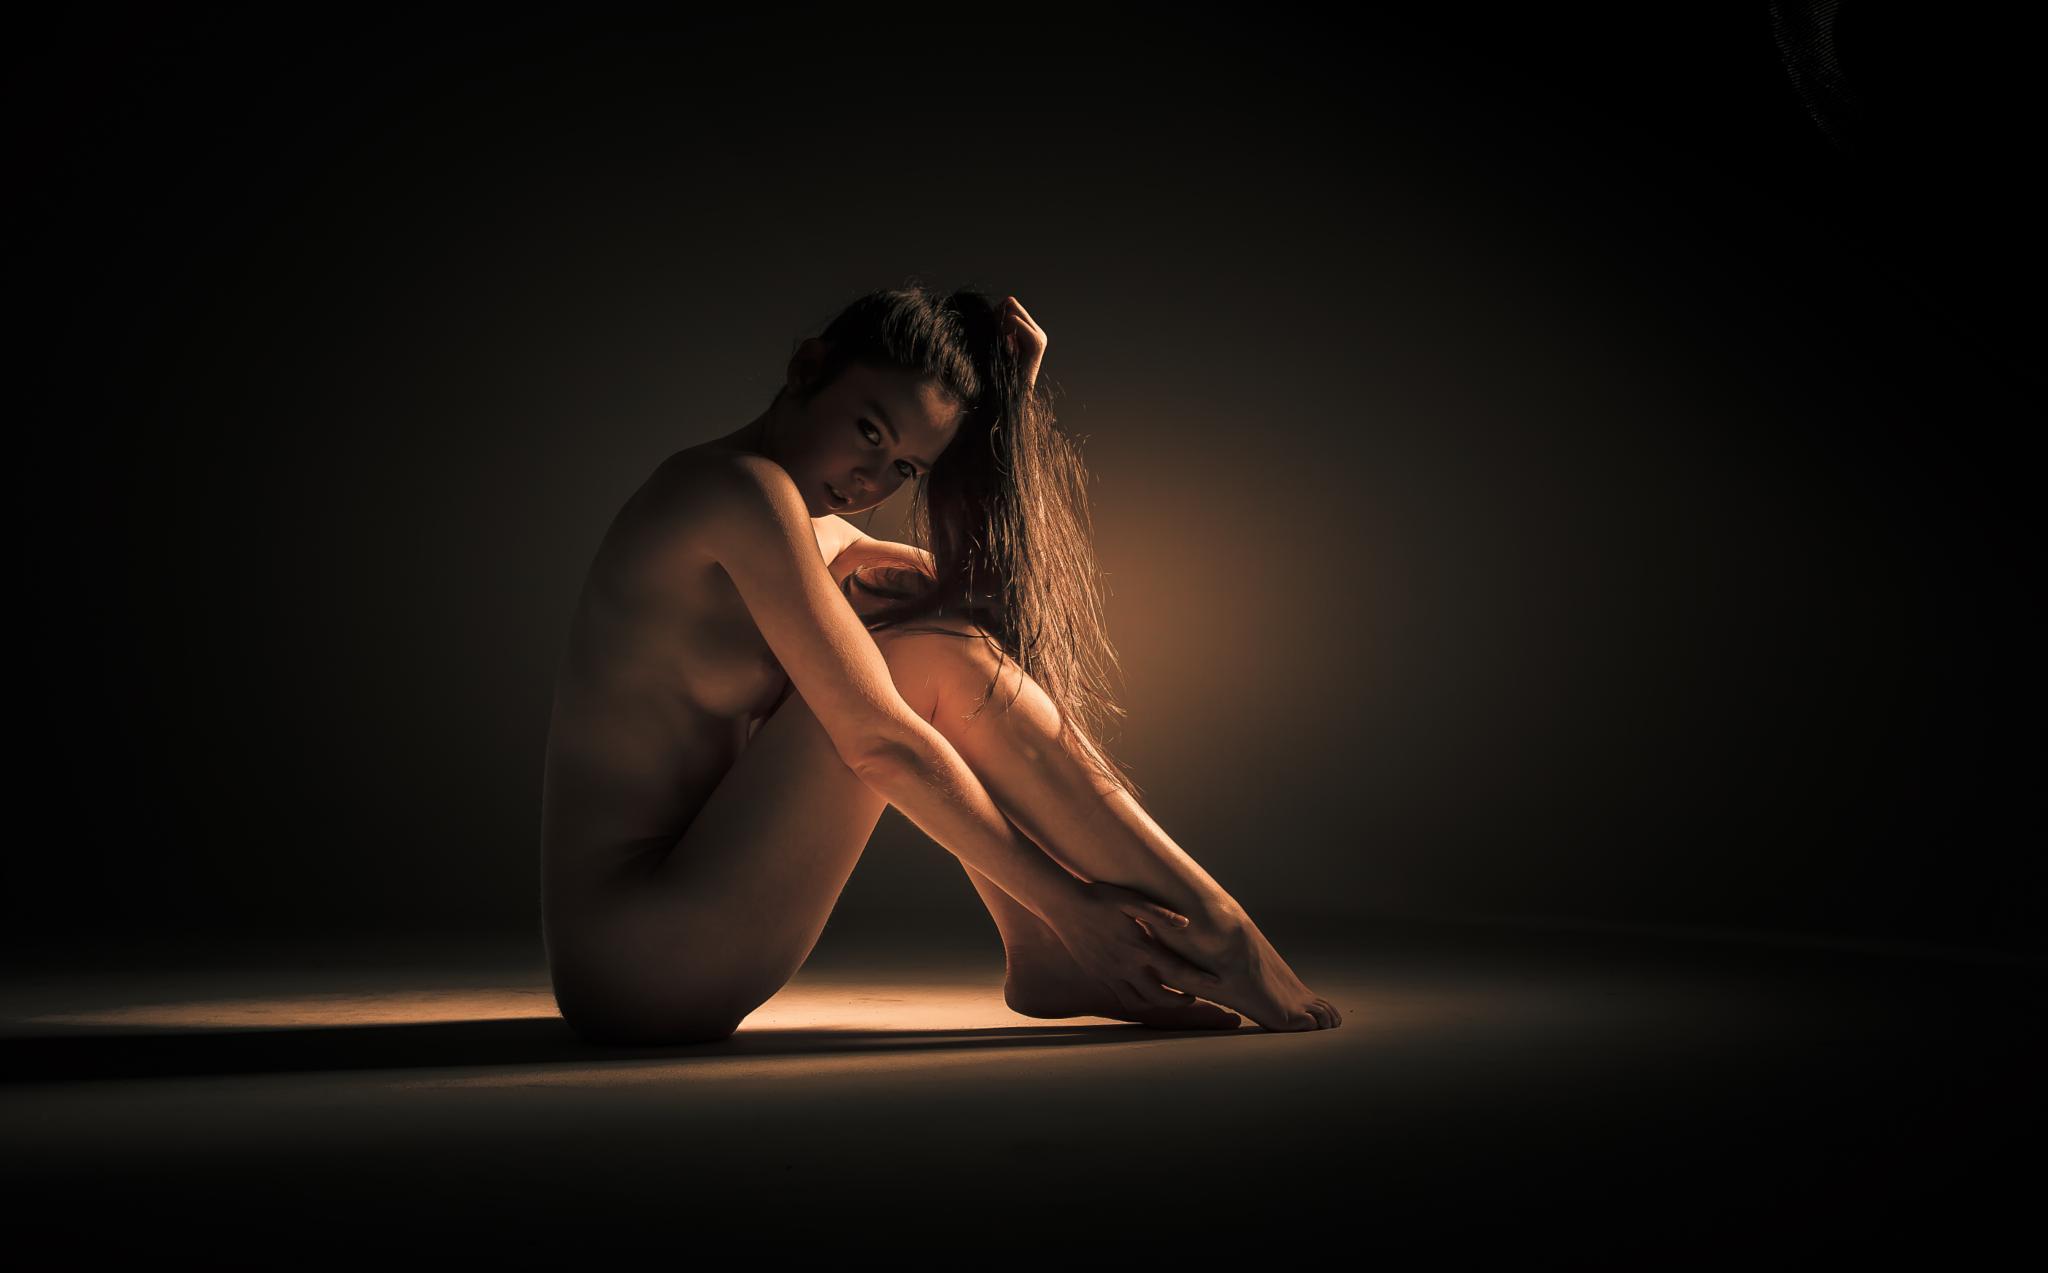 In the spotlight by Bramley